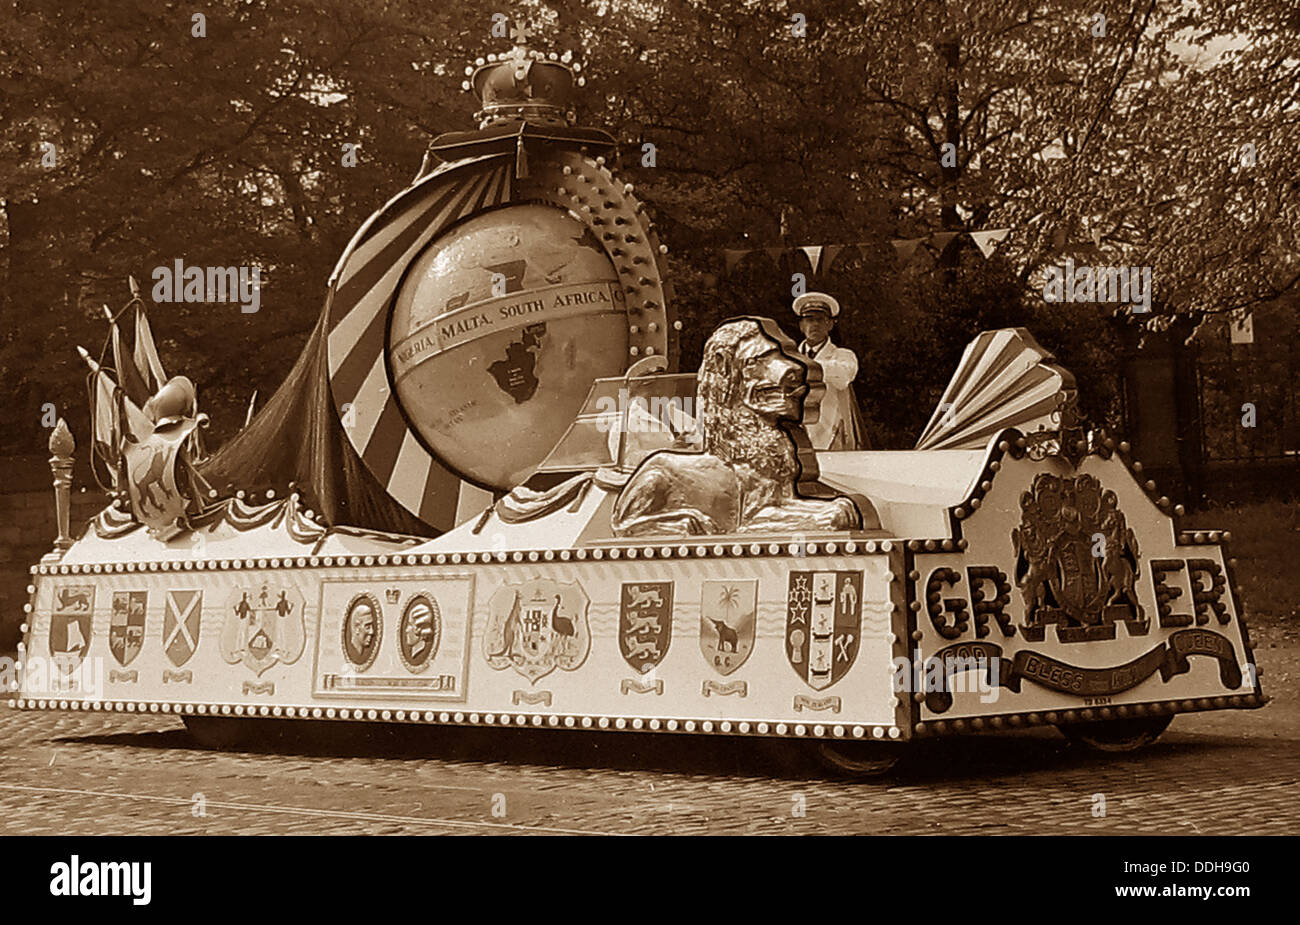 Burnley Coronation Tram in 1937 - Stock Image